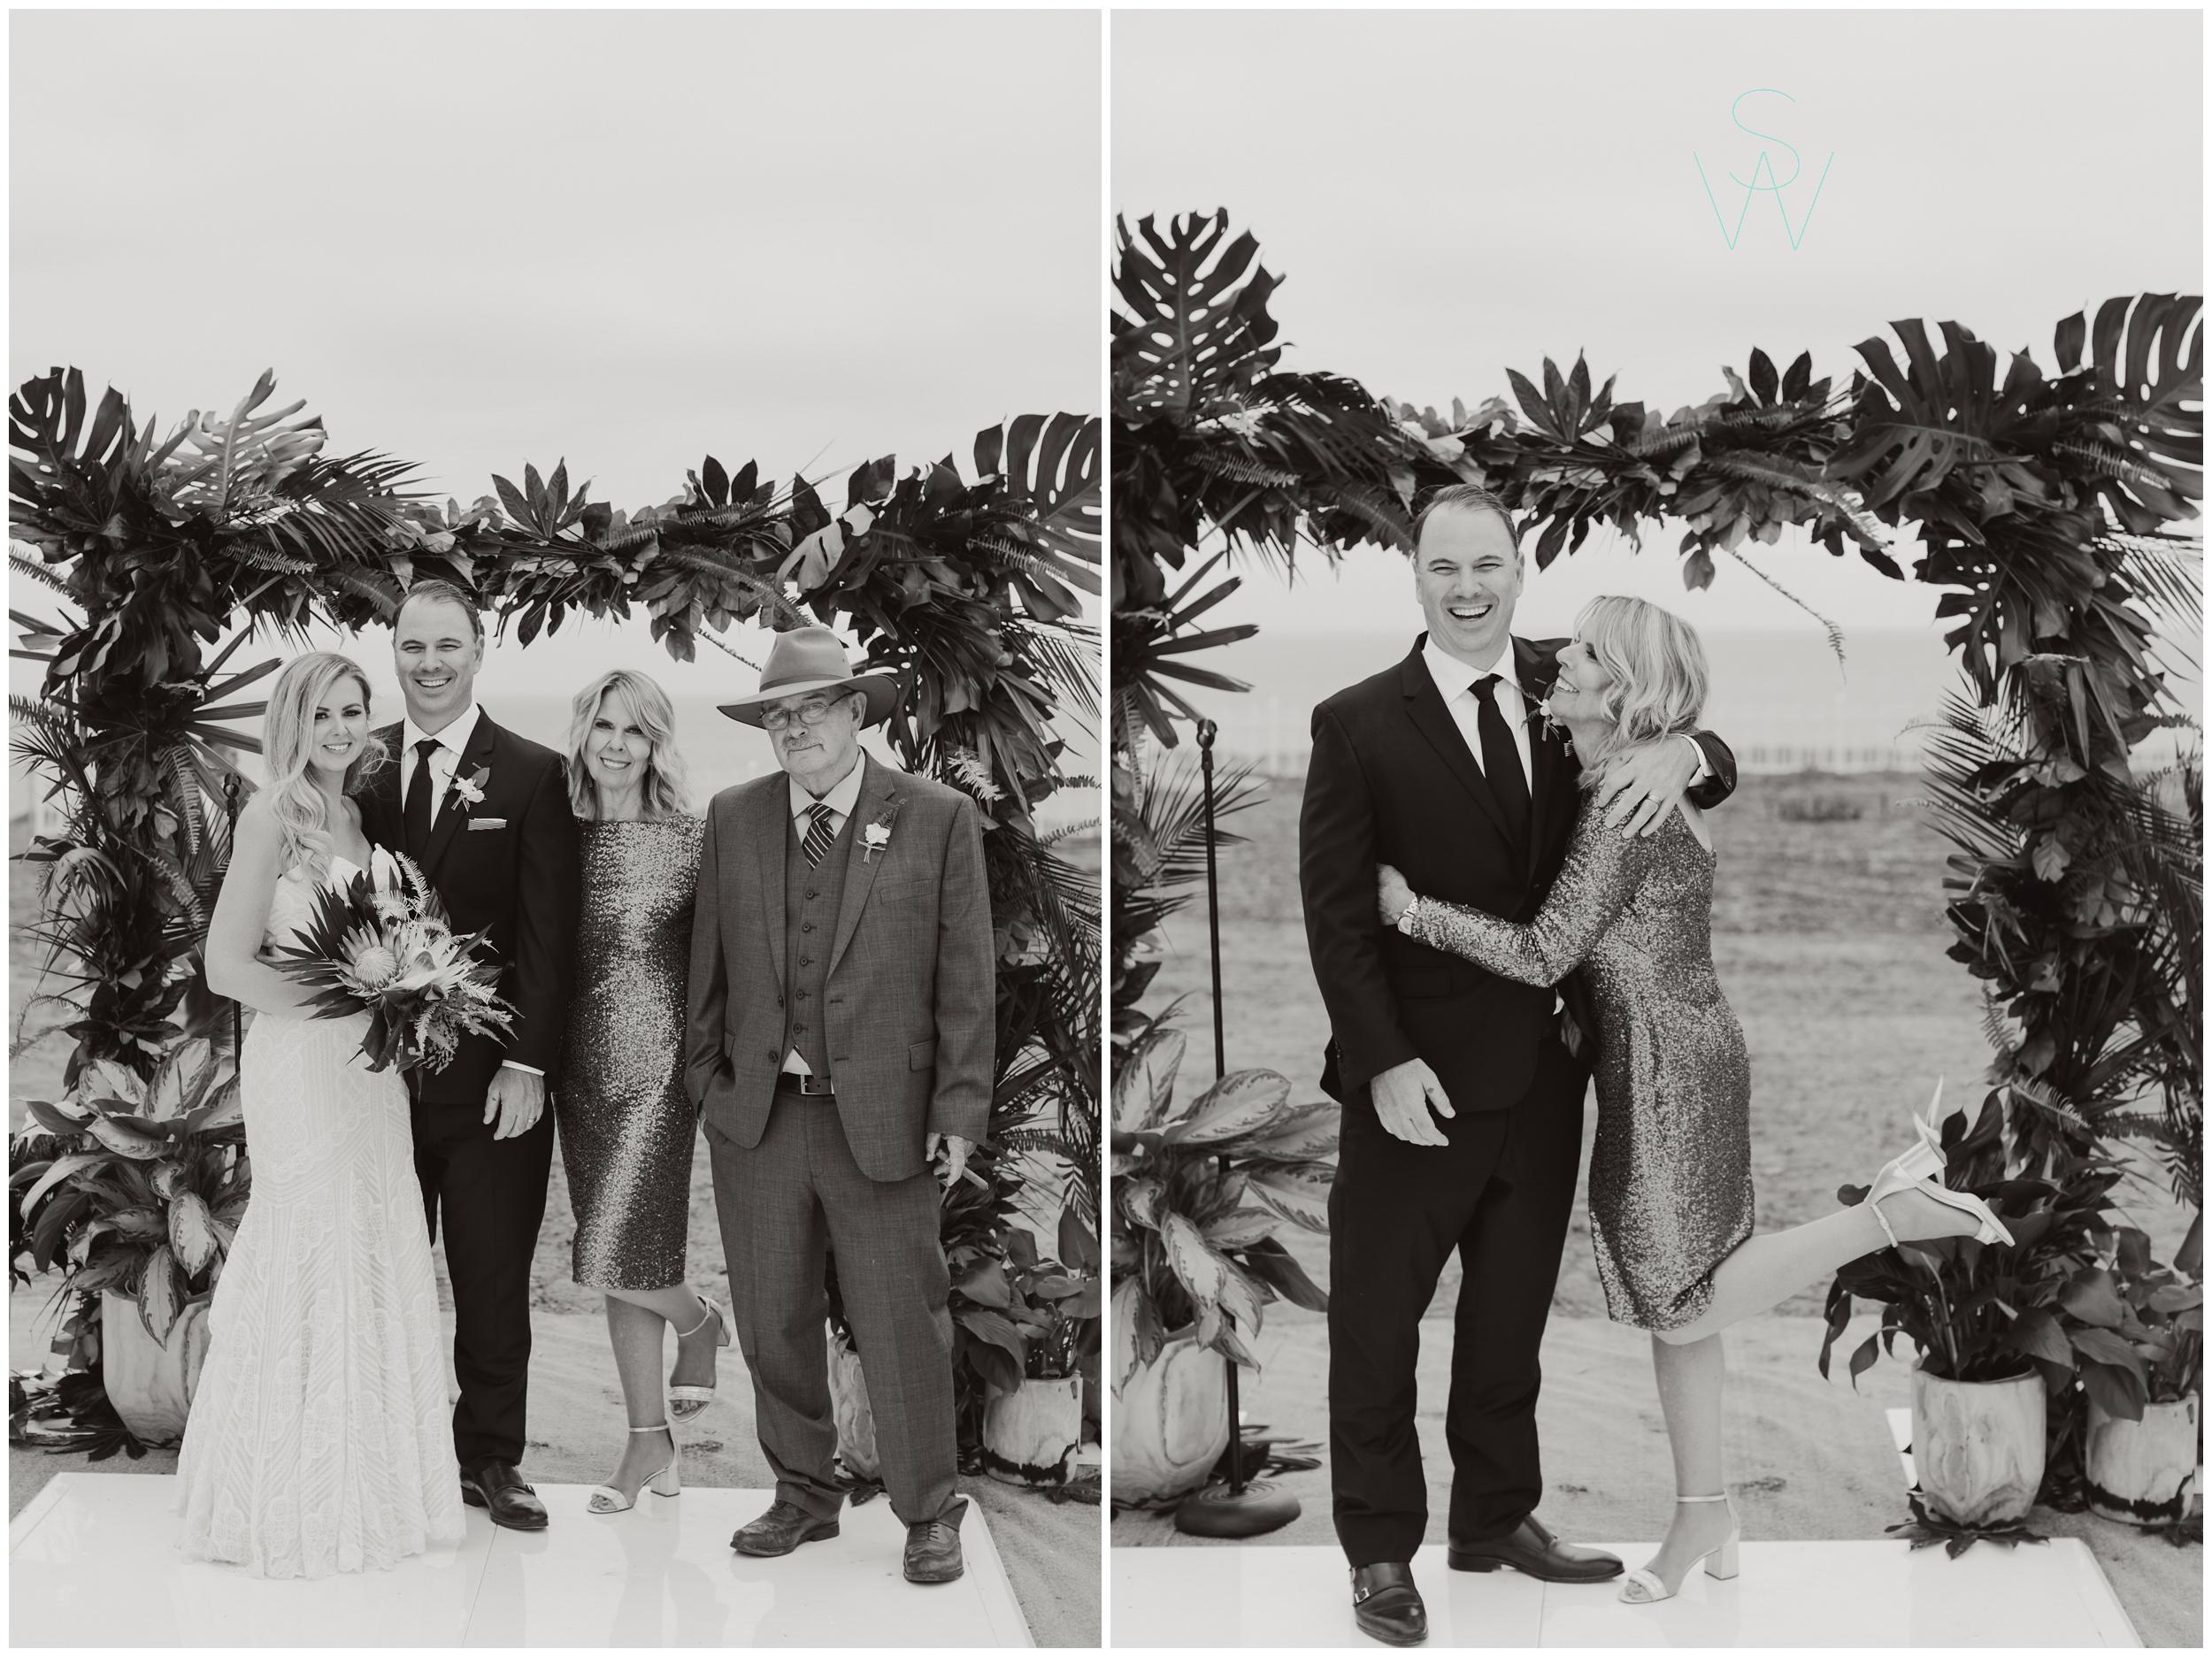 shewanders.san.diego.wedding.brigatine.isari-151.jpg